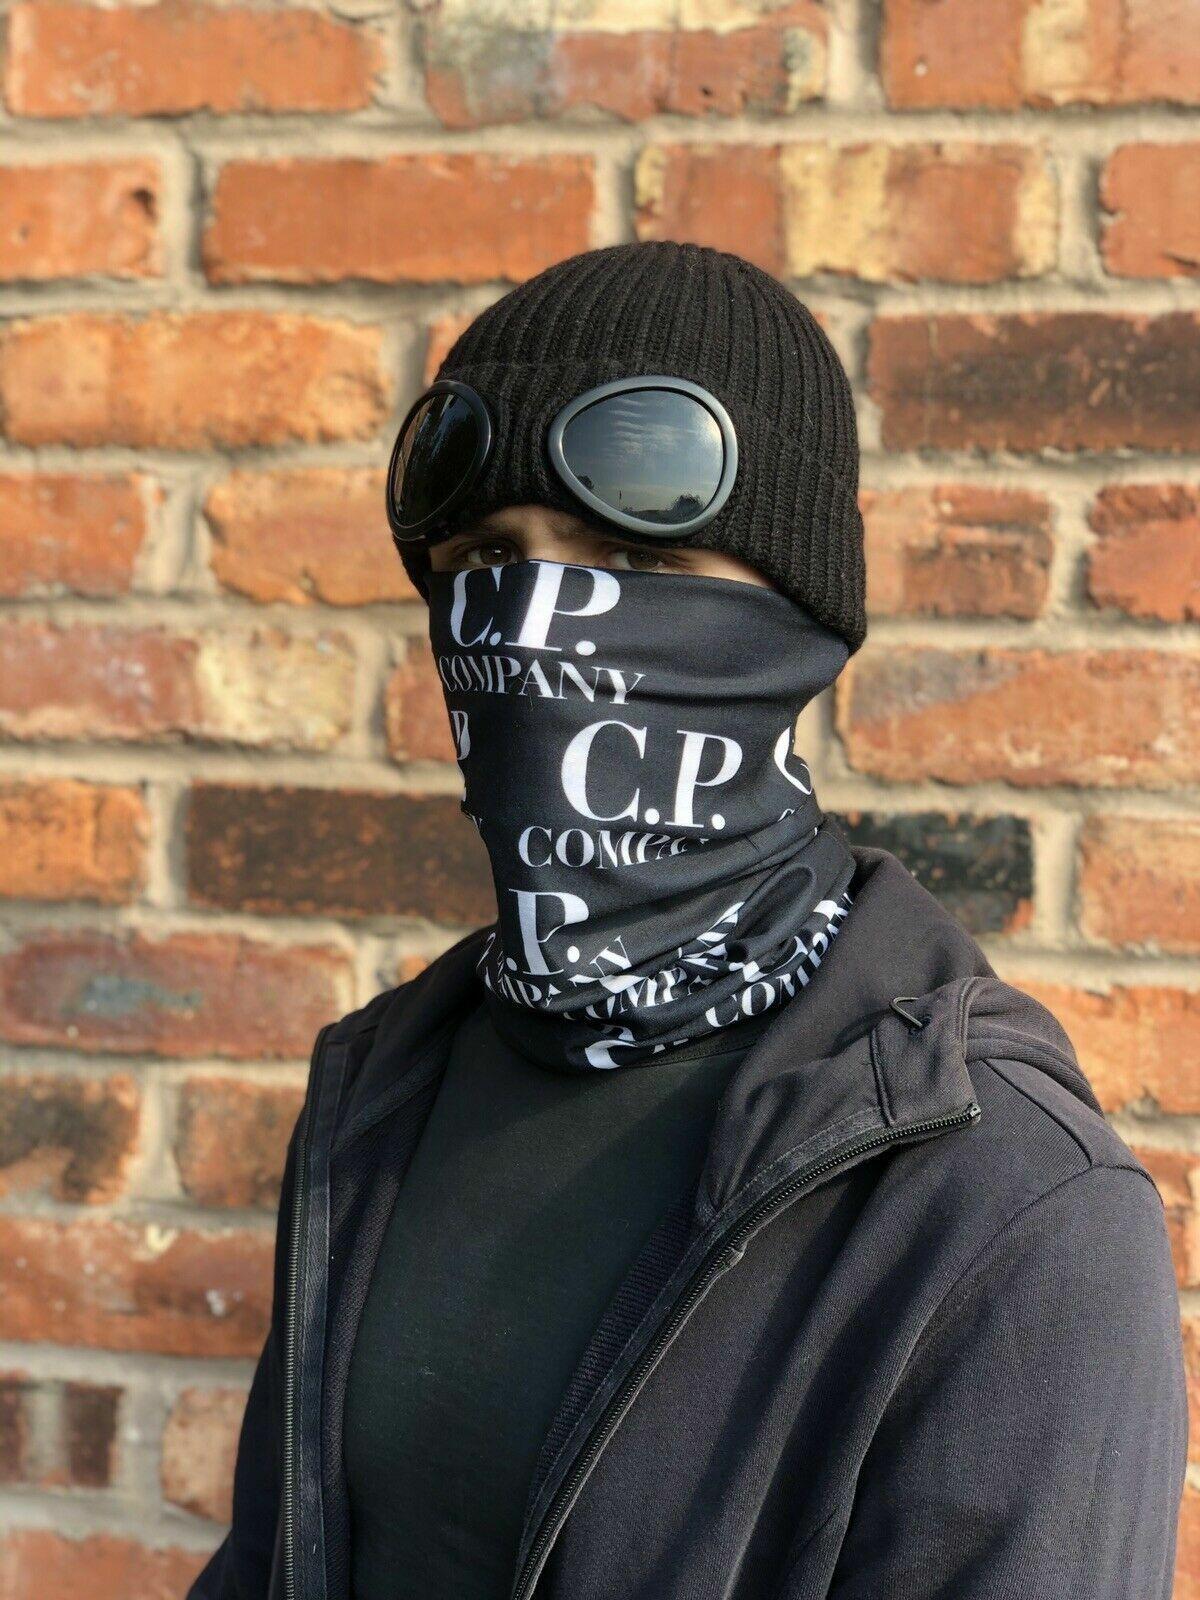 CP Logo Print Multi-use Balaclava Face Mask Tube Snood Bandanna Headband